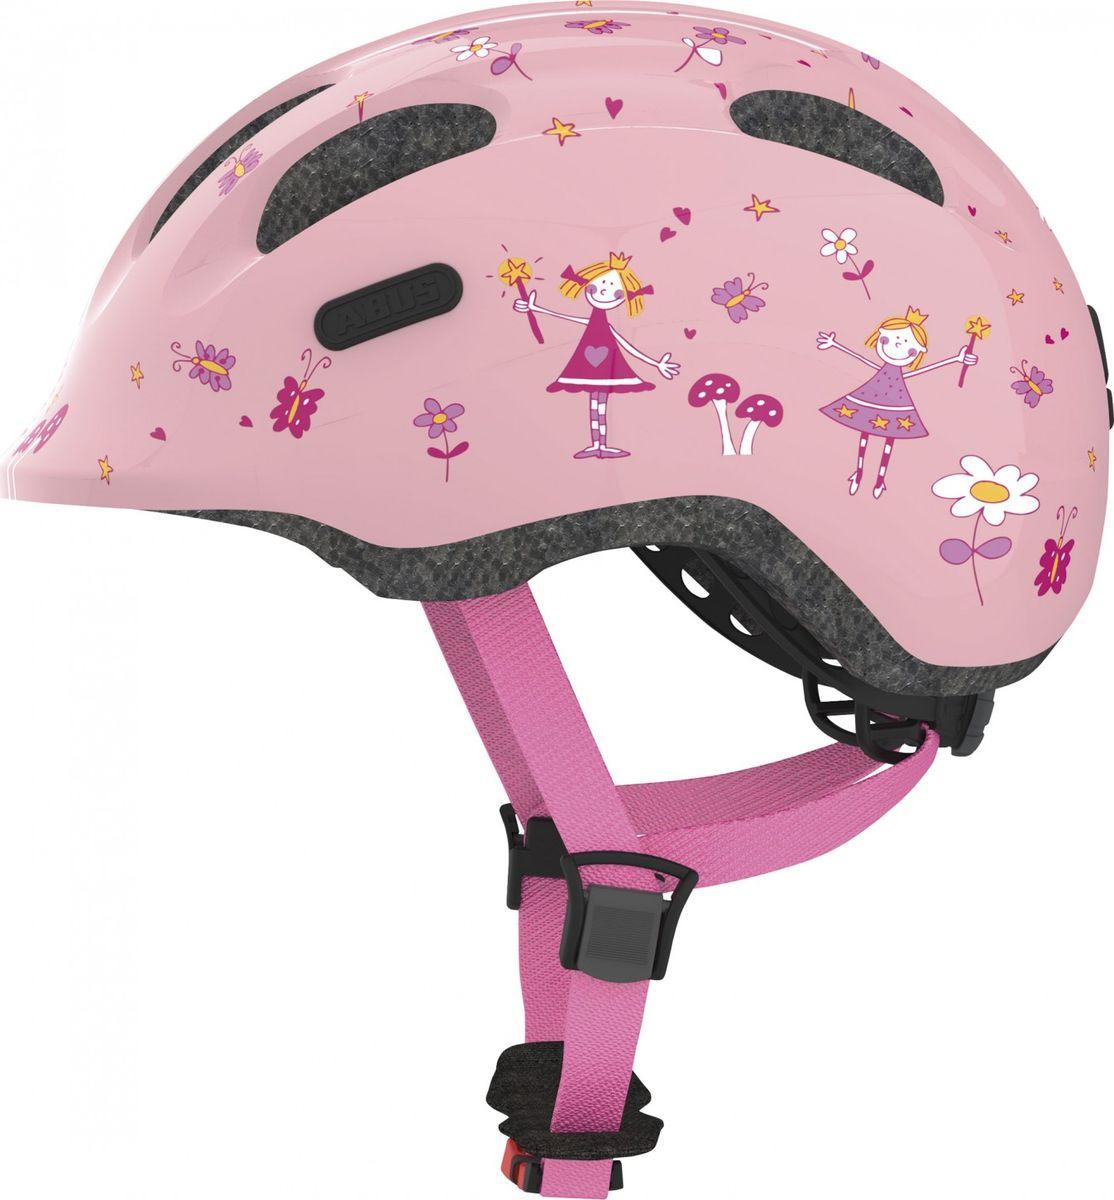 Шлем защитный Abus Smiley 2.0 Принцесса, розовый, размер M (50-55) велошлем детский abus smiley пчелы размер m 50 55